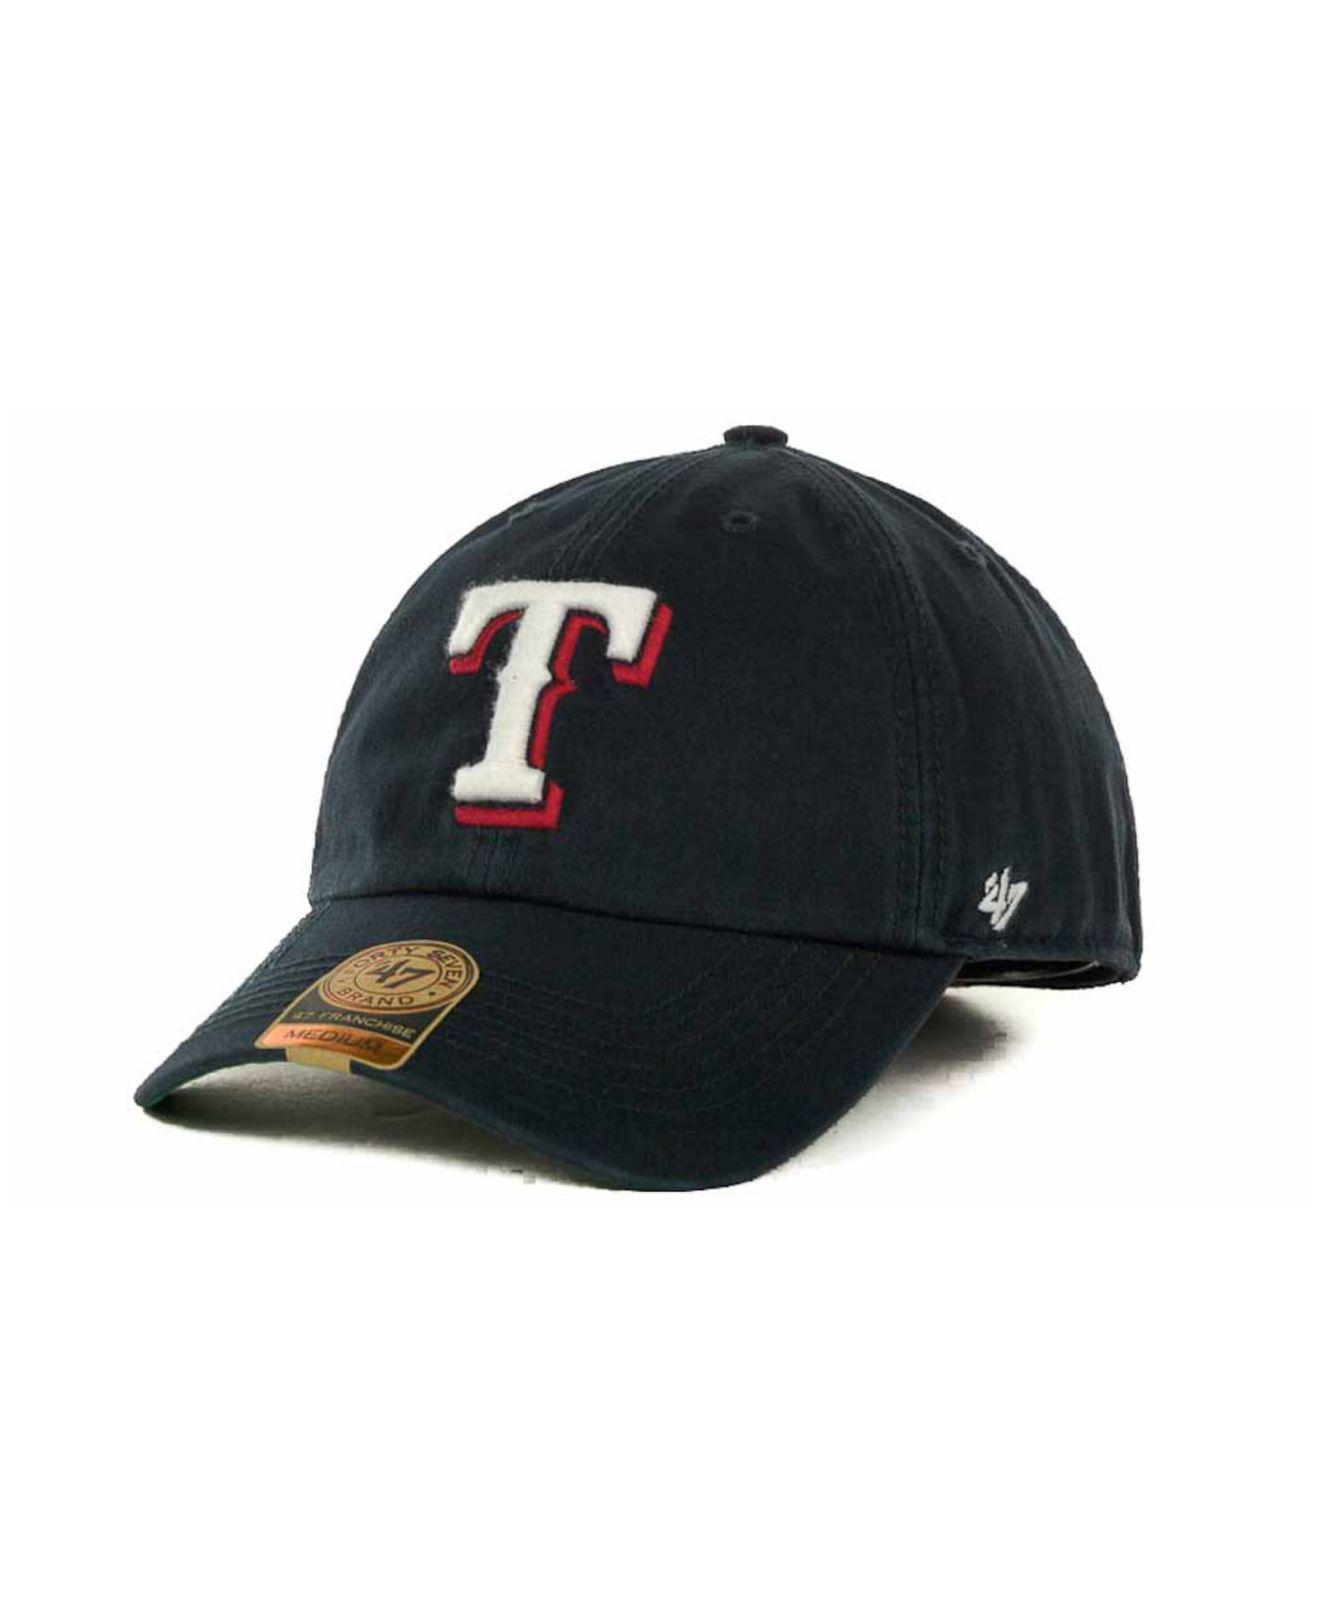 Lyst - 47 Brand Texas Rangers Mlb  47 Franchise Cap in Blue for Men fea201fa4fbd